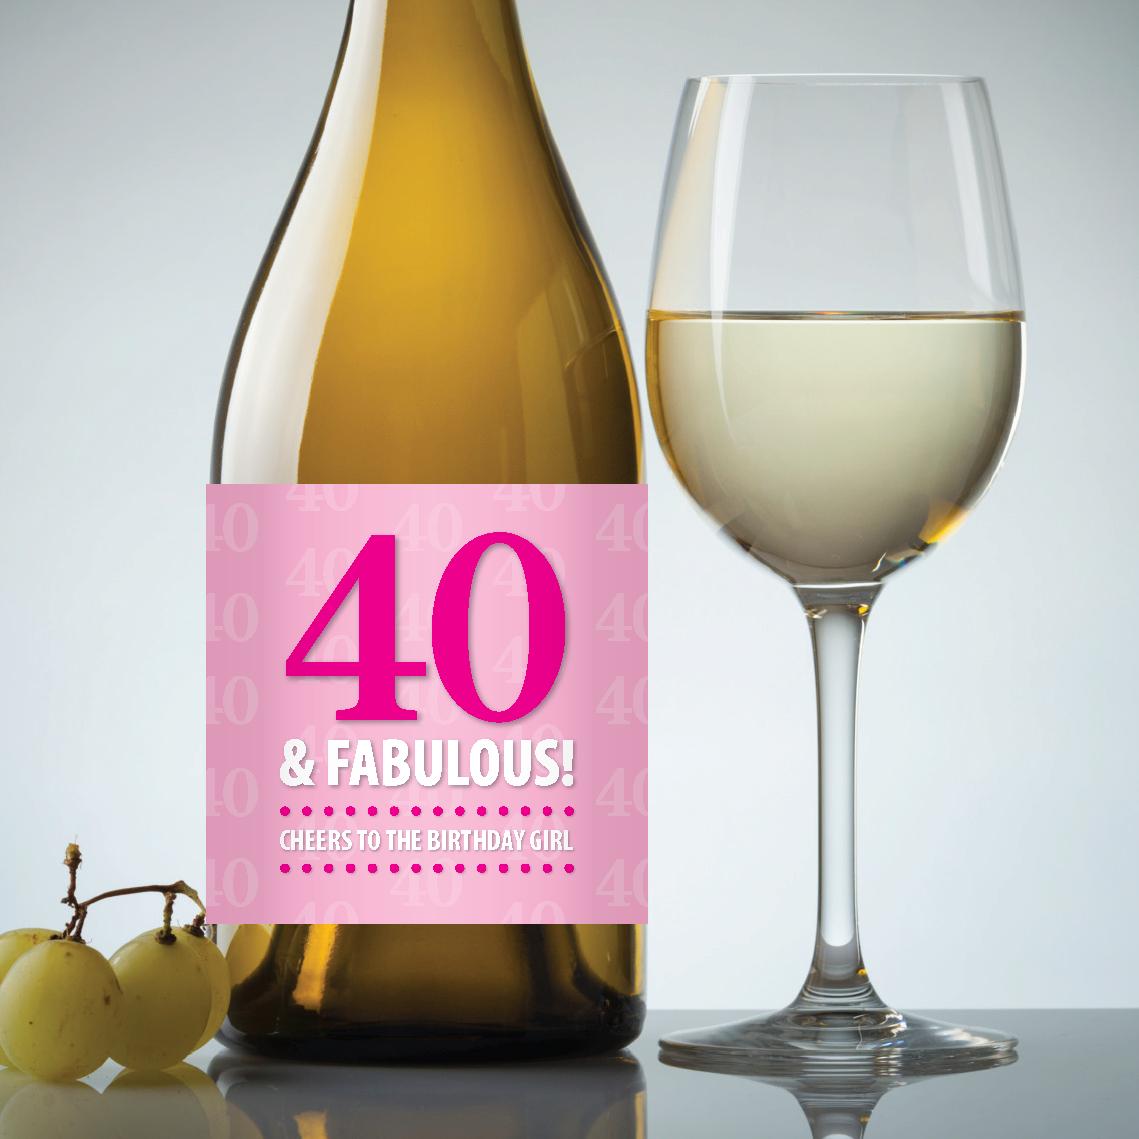 40 & Fabulous – 40Th Birthday Pdf Printable Wine Label Download In - Free Printable Wine Labels For Birthday